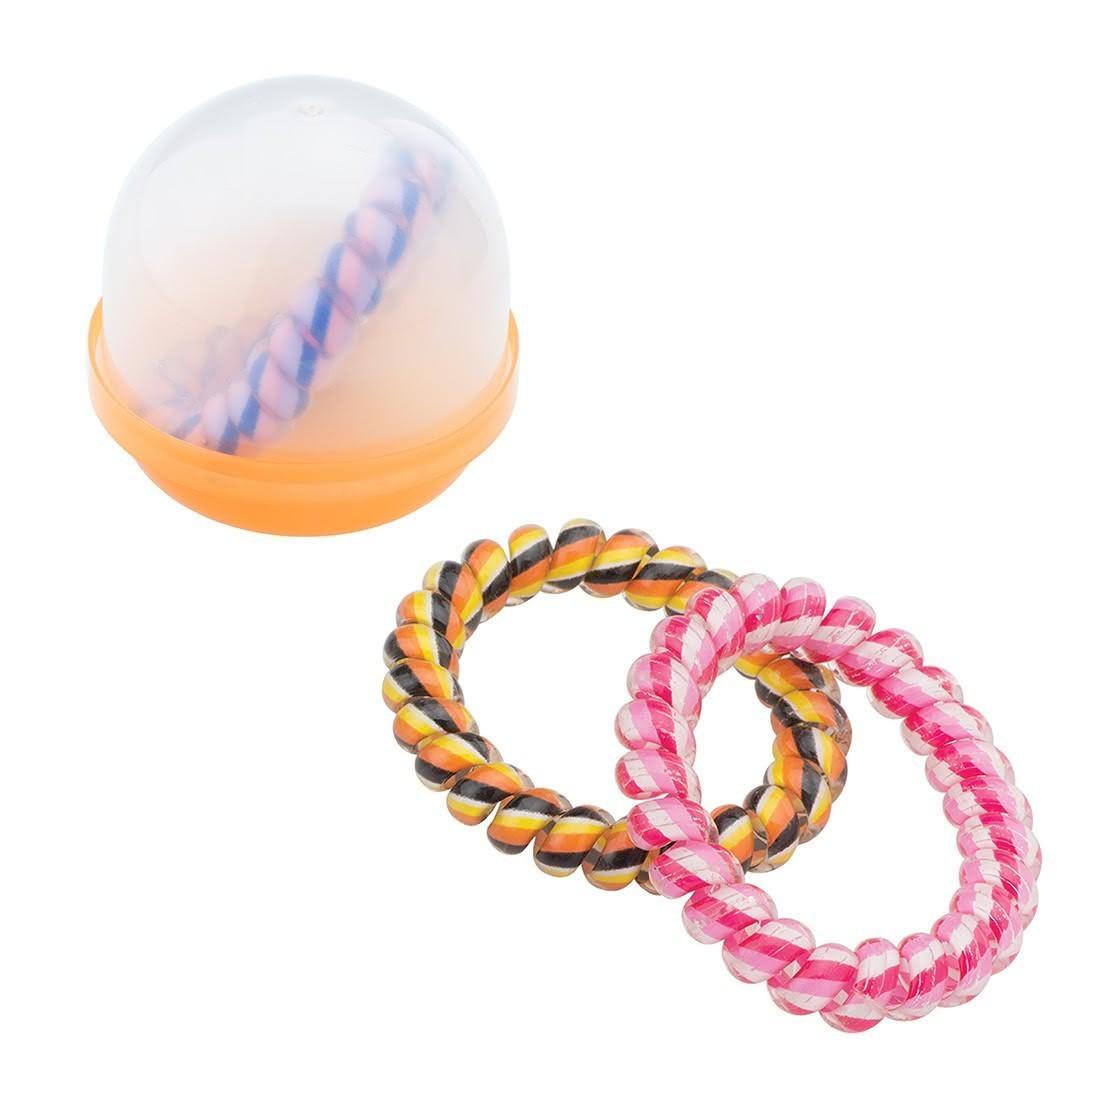 "Fun Cord Bracelets in 2"" Capsules [image]"